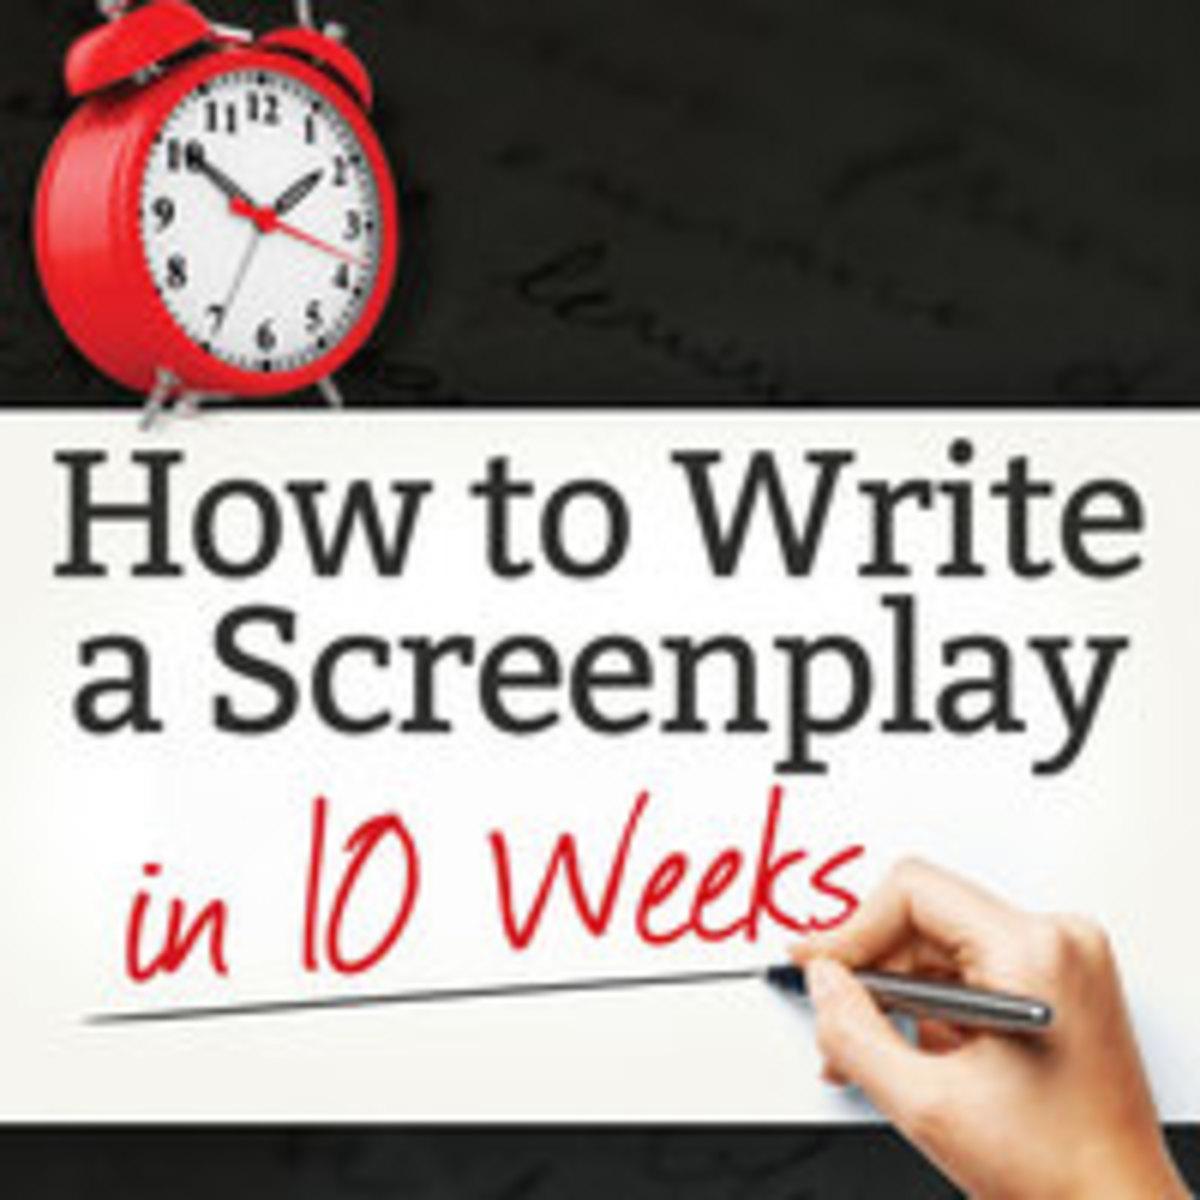 writescreenplay10weeks-500_small